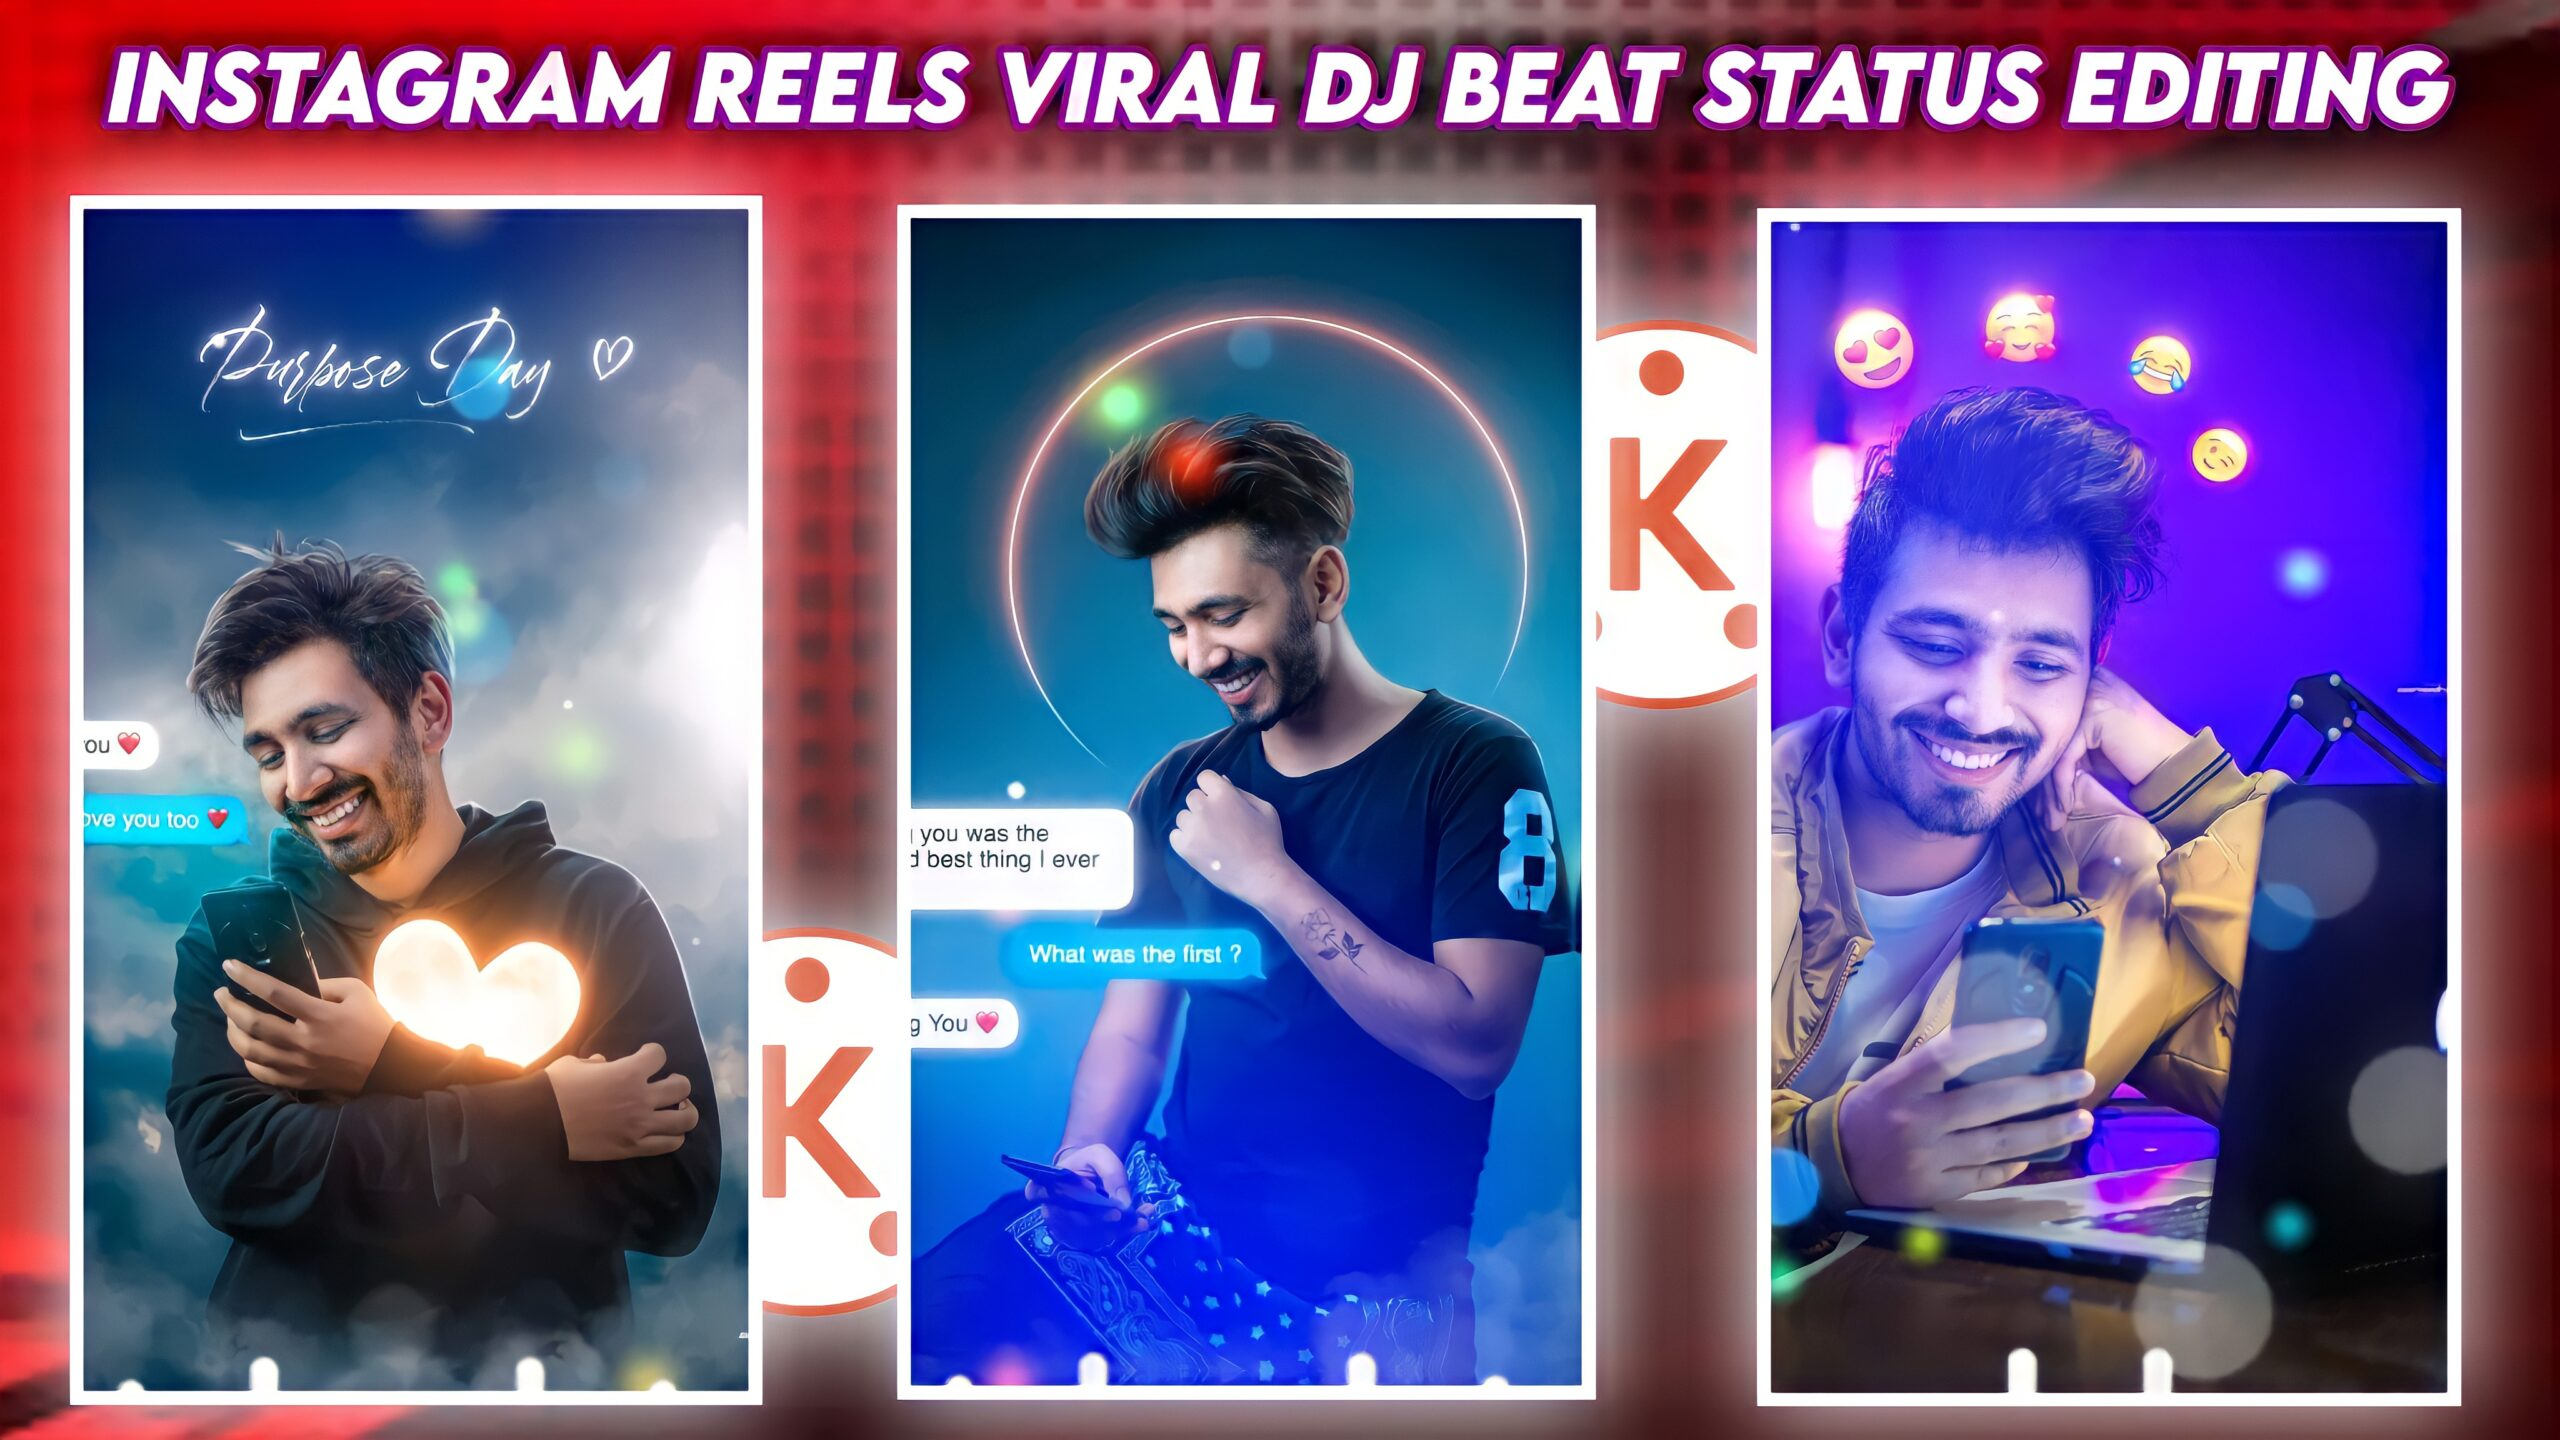 Instagram Reels viral DJ beat Status editing 2021.